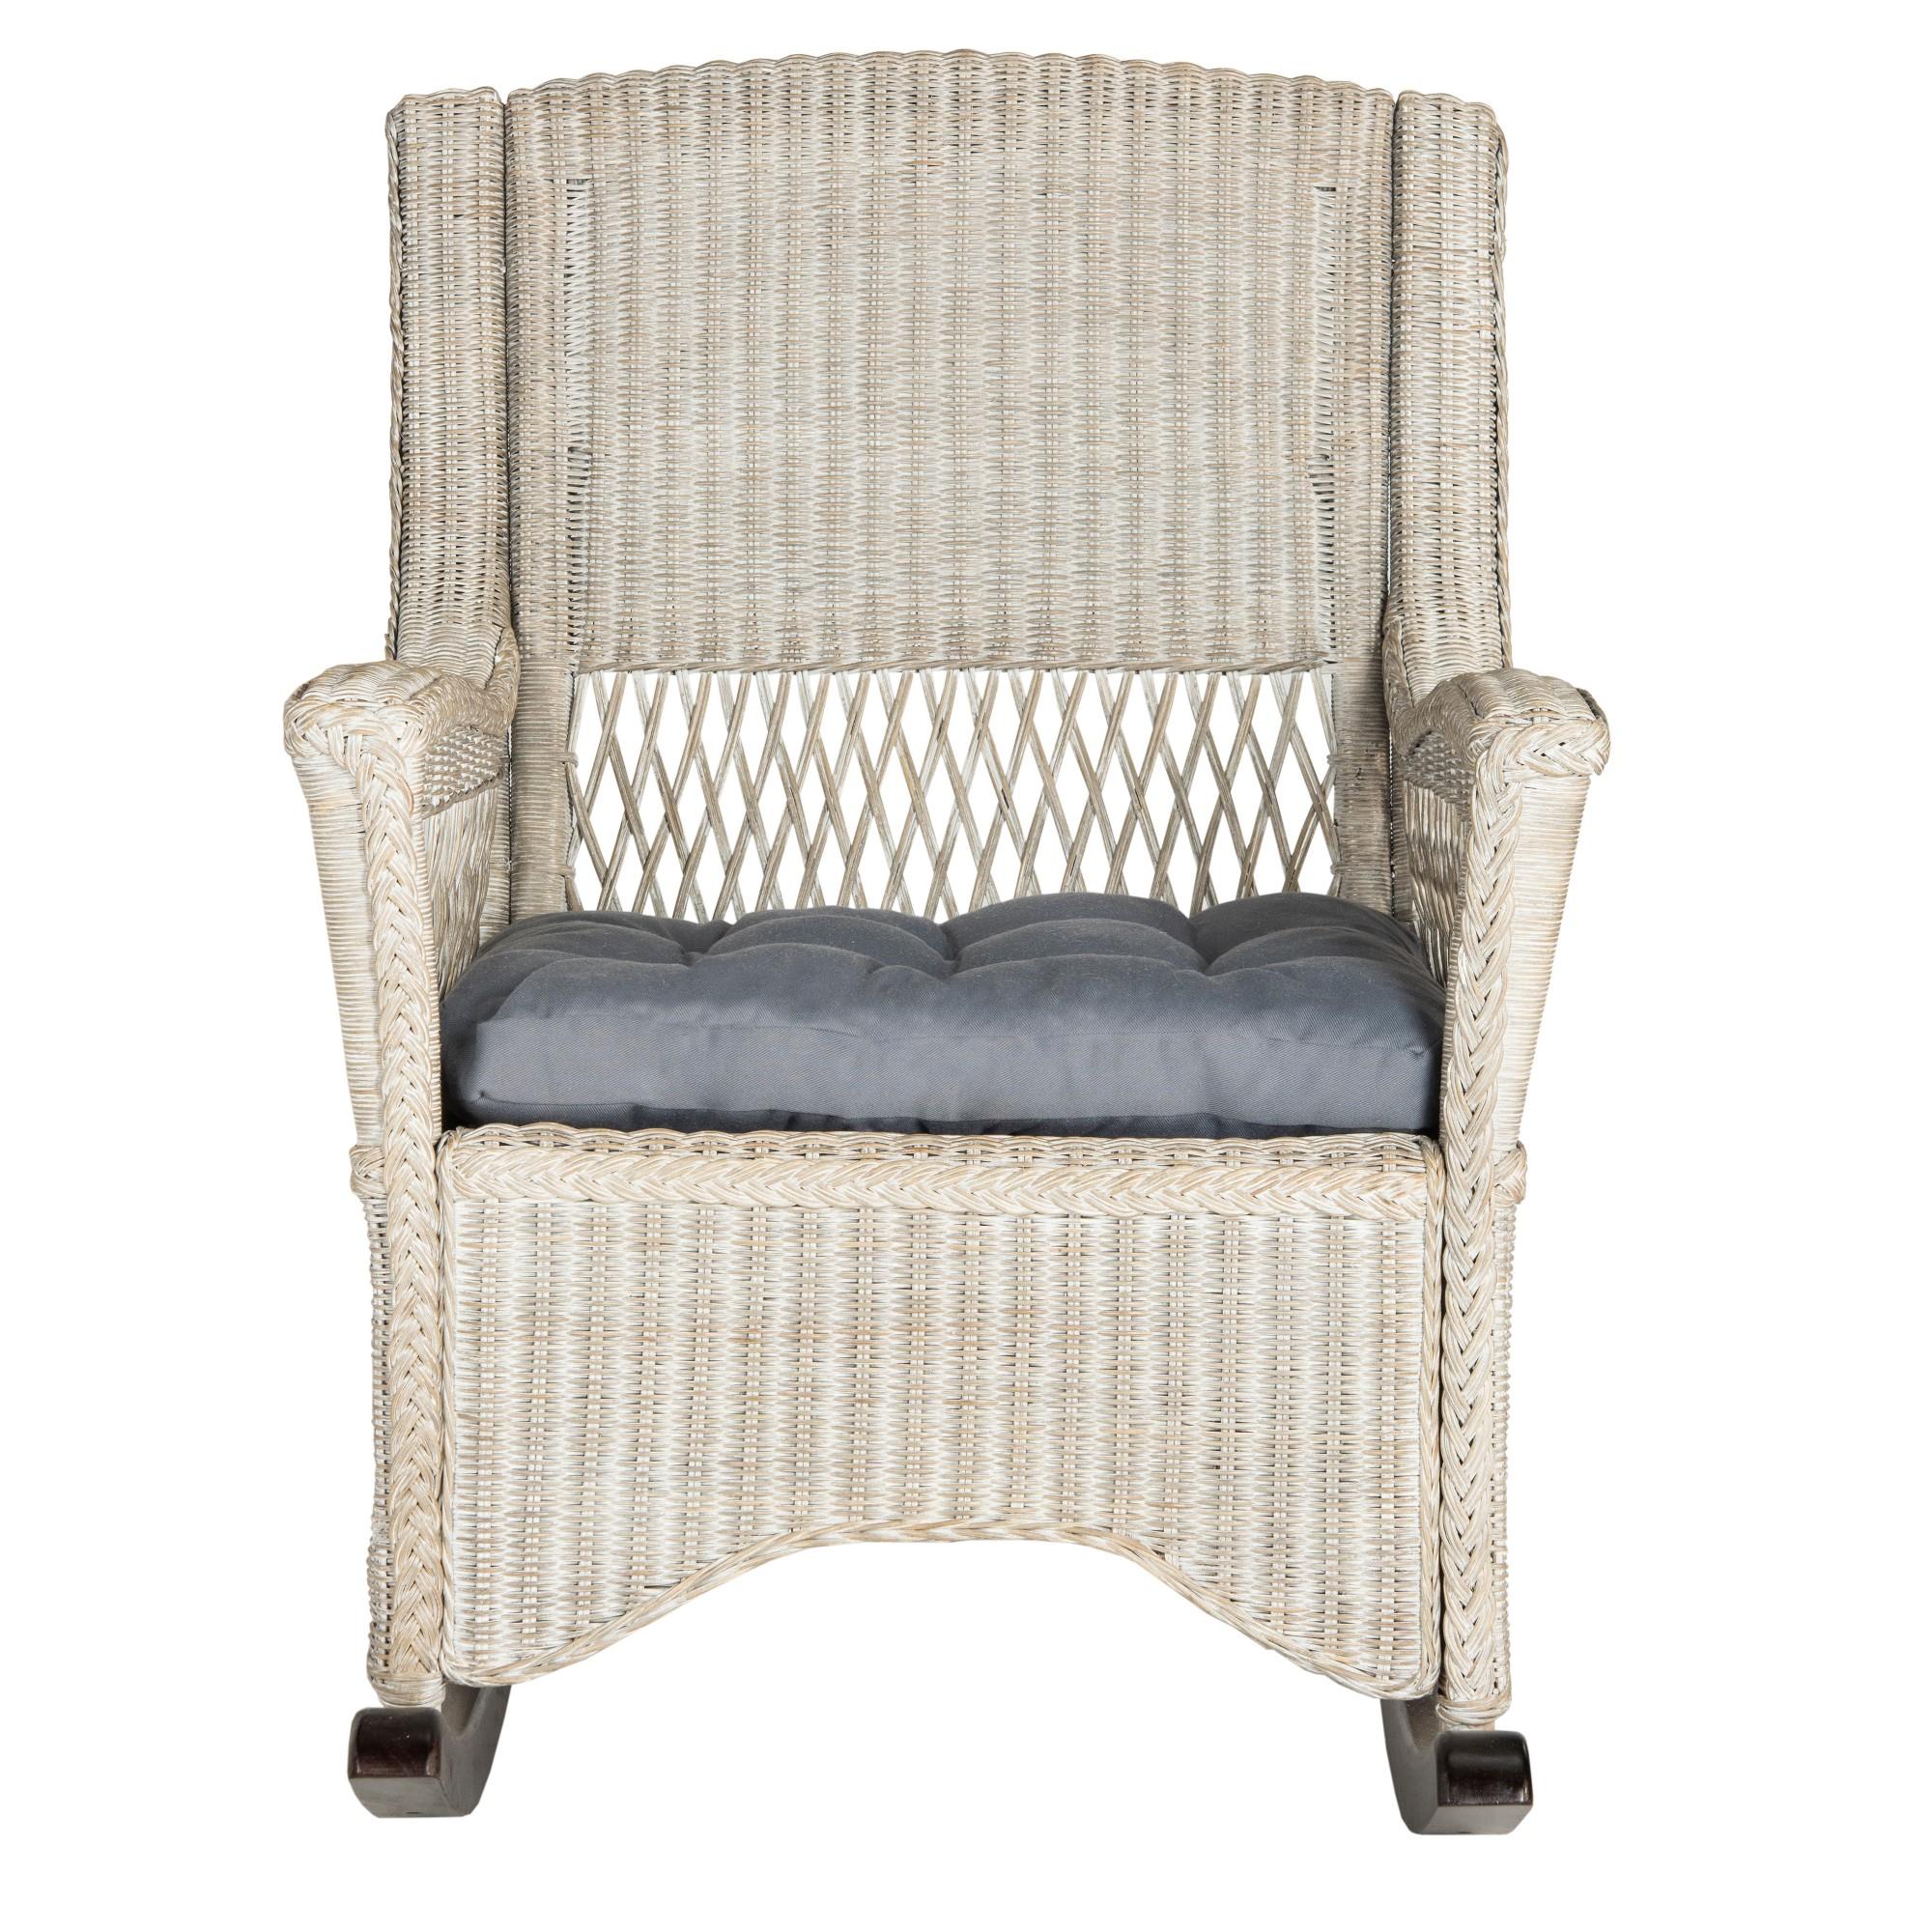 Aria Rocking Chair Antique Gray Safavieh , Adult